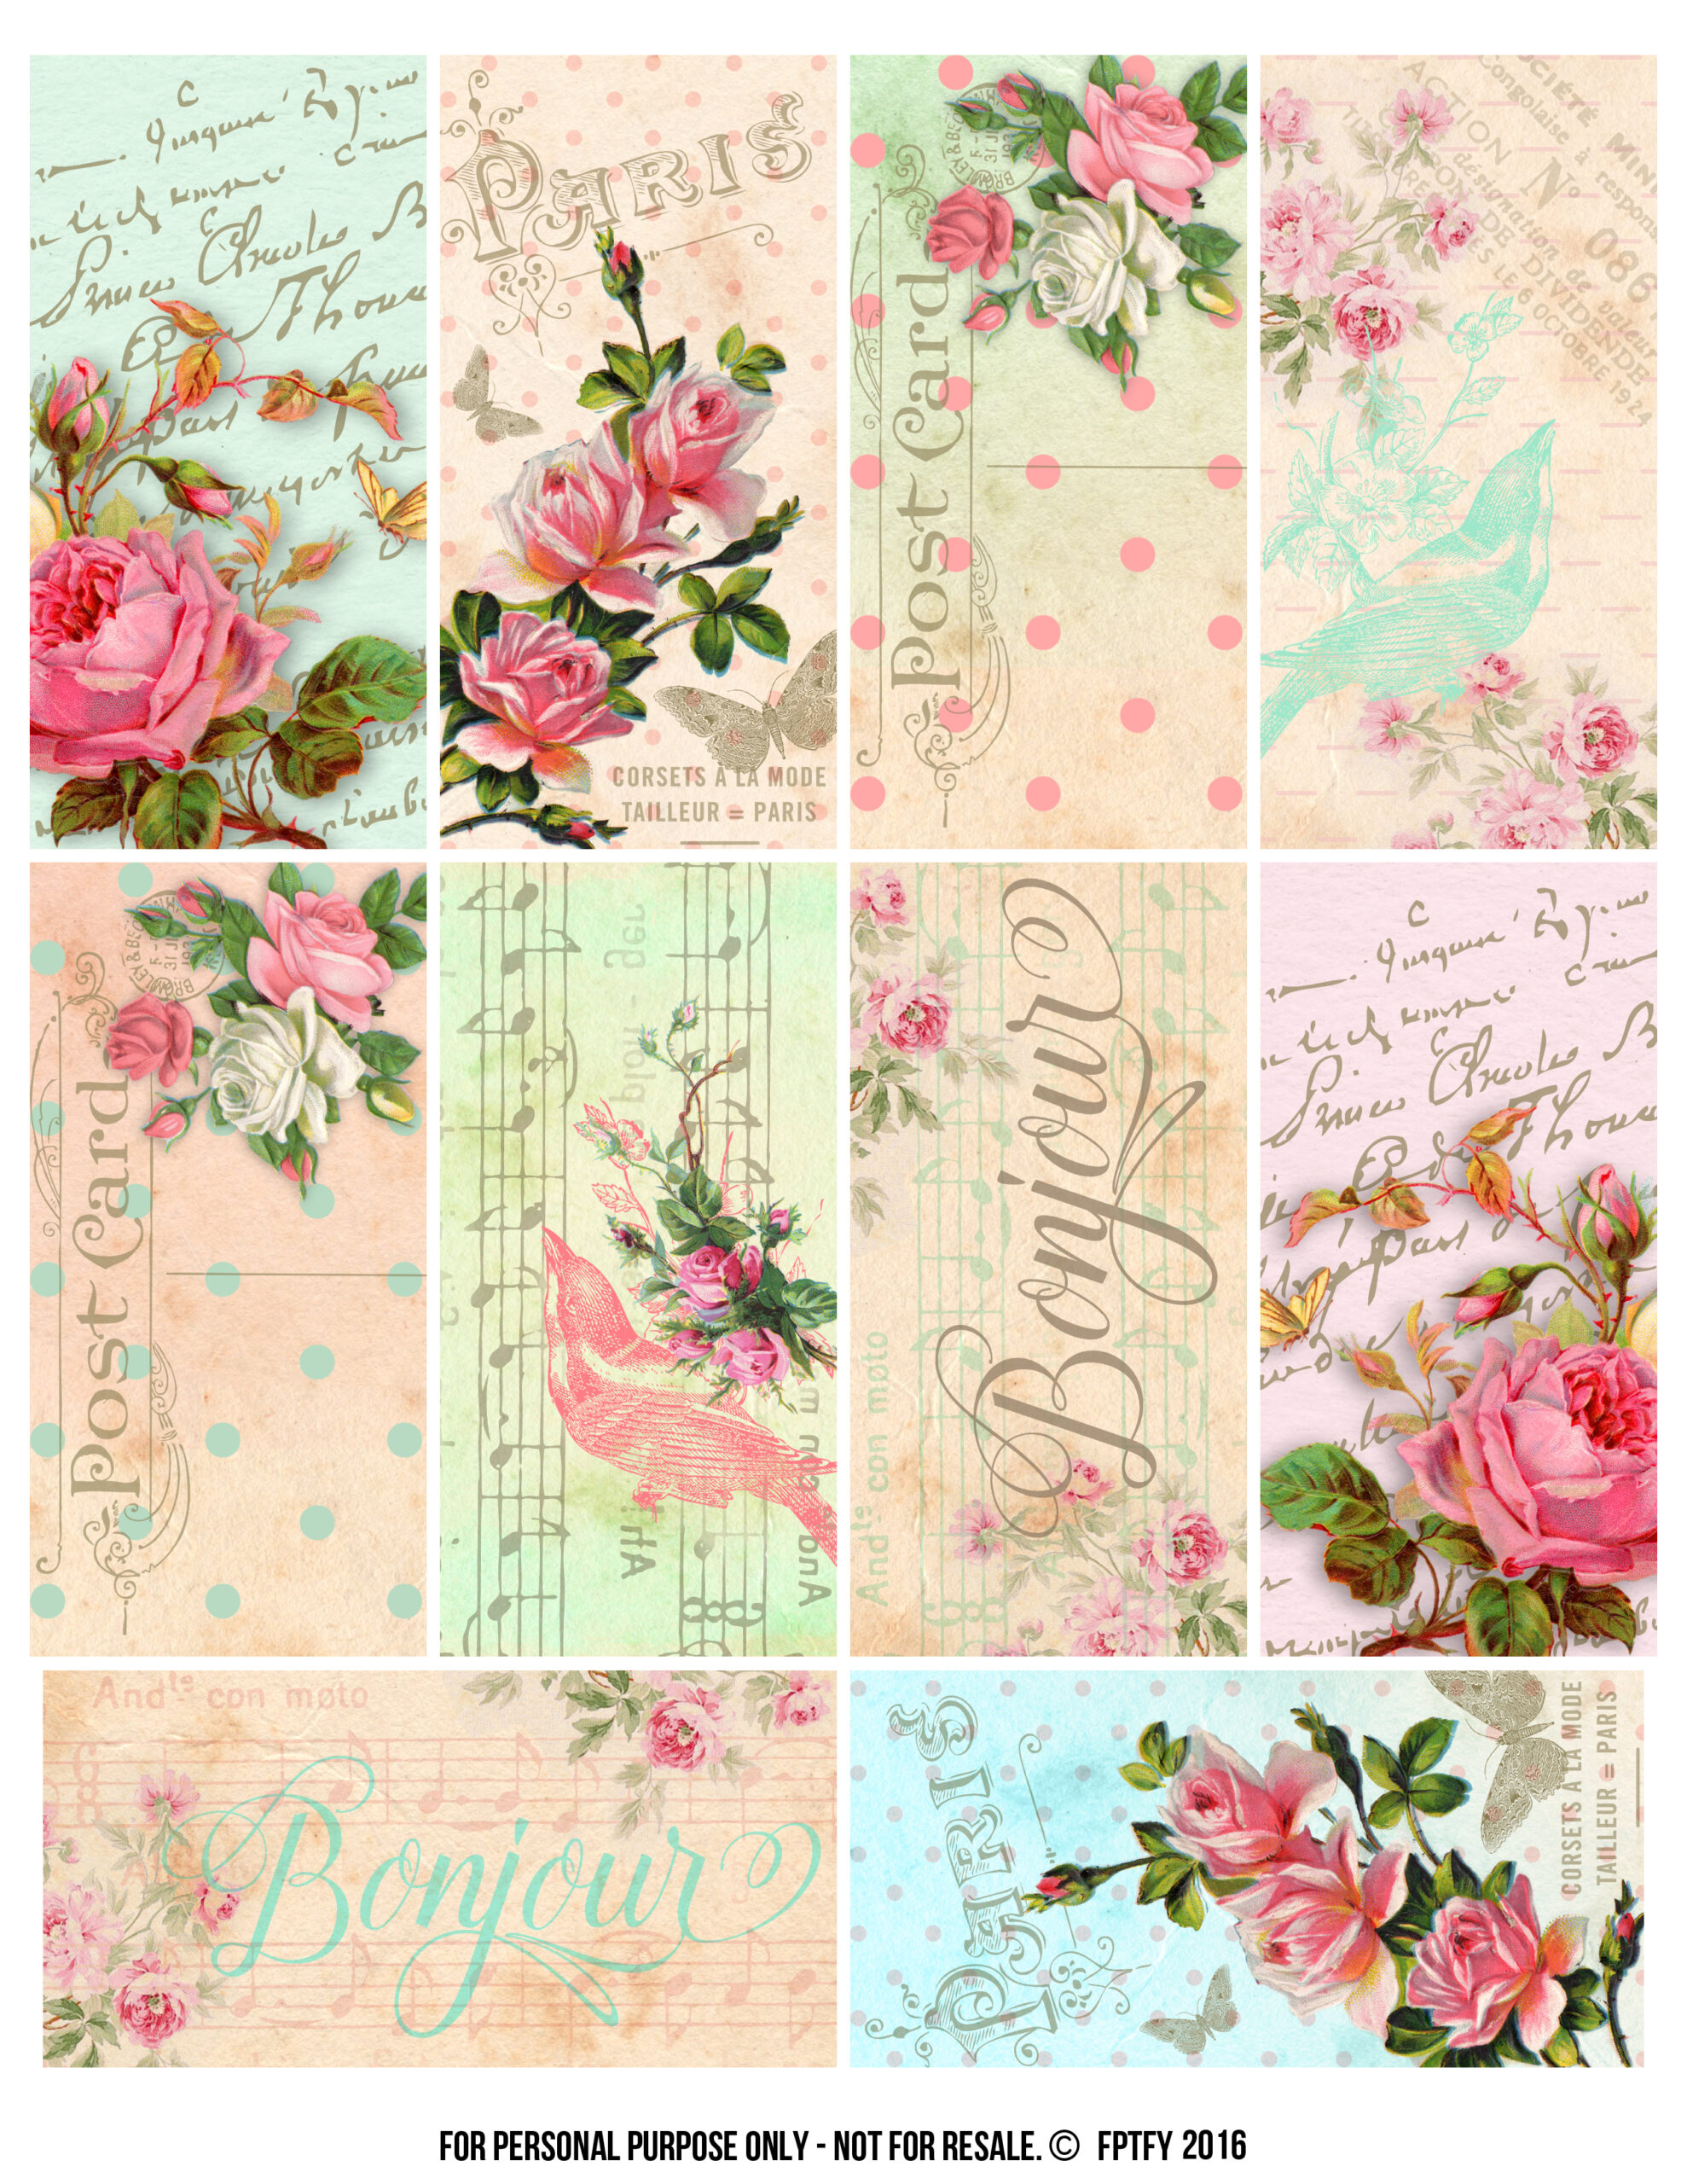 Parisian Romantic Scrapbook Printables Free Pretty Things For You